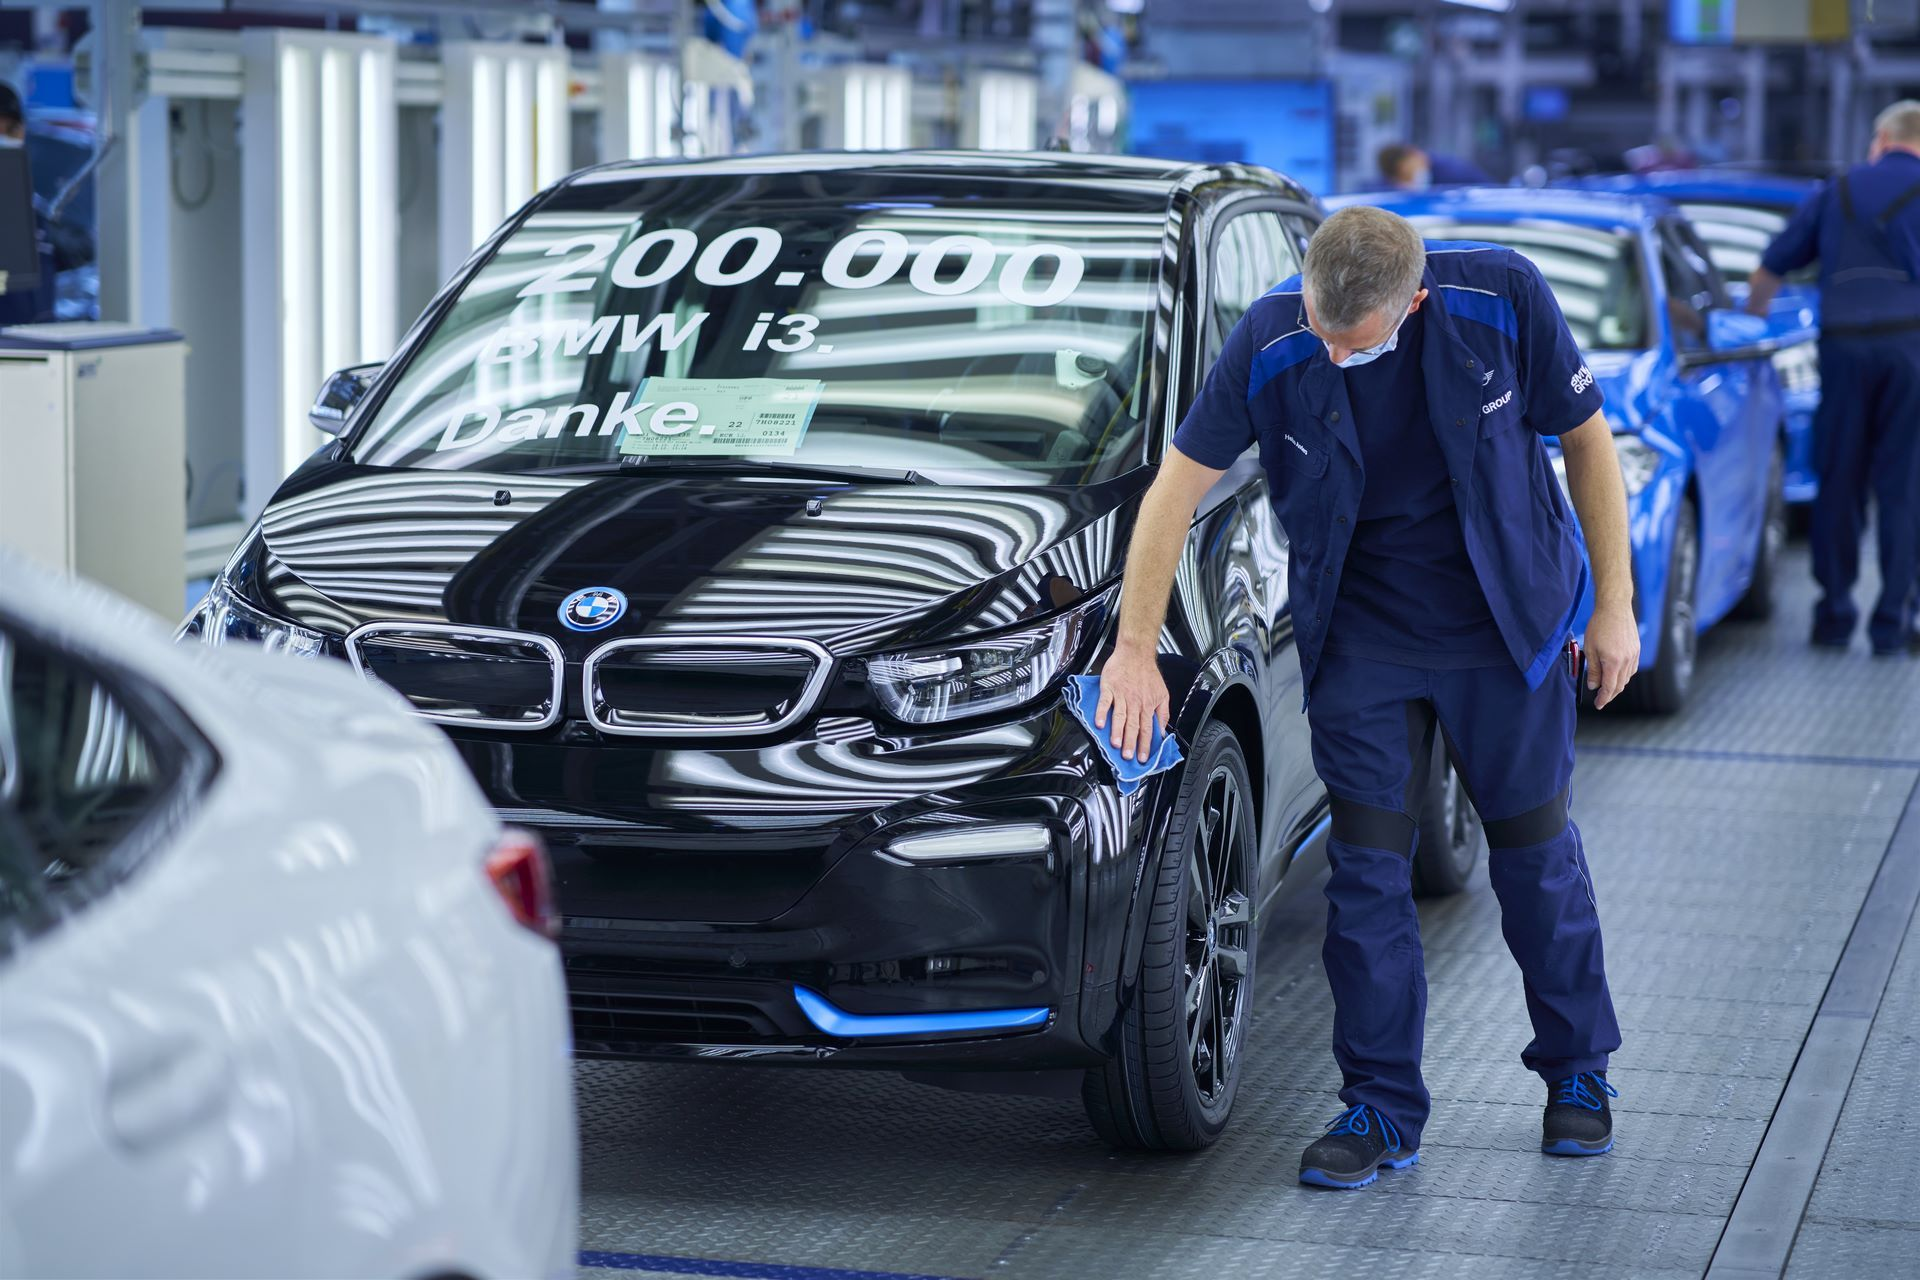 BMW-i8-plant-production-56